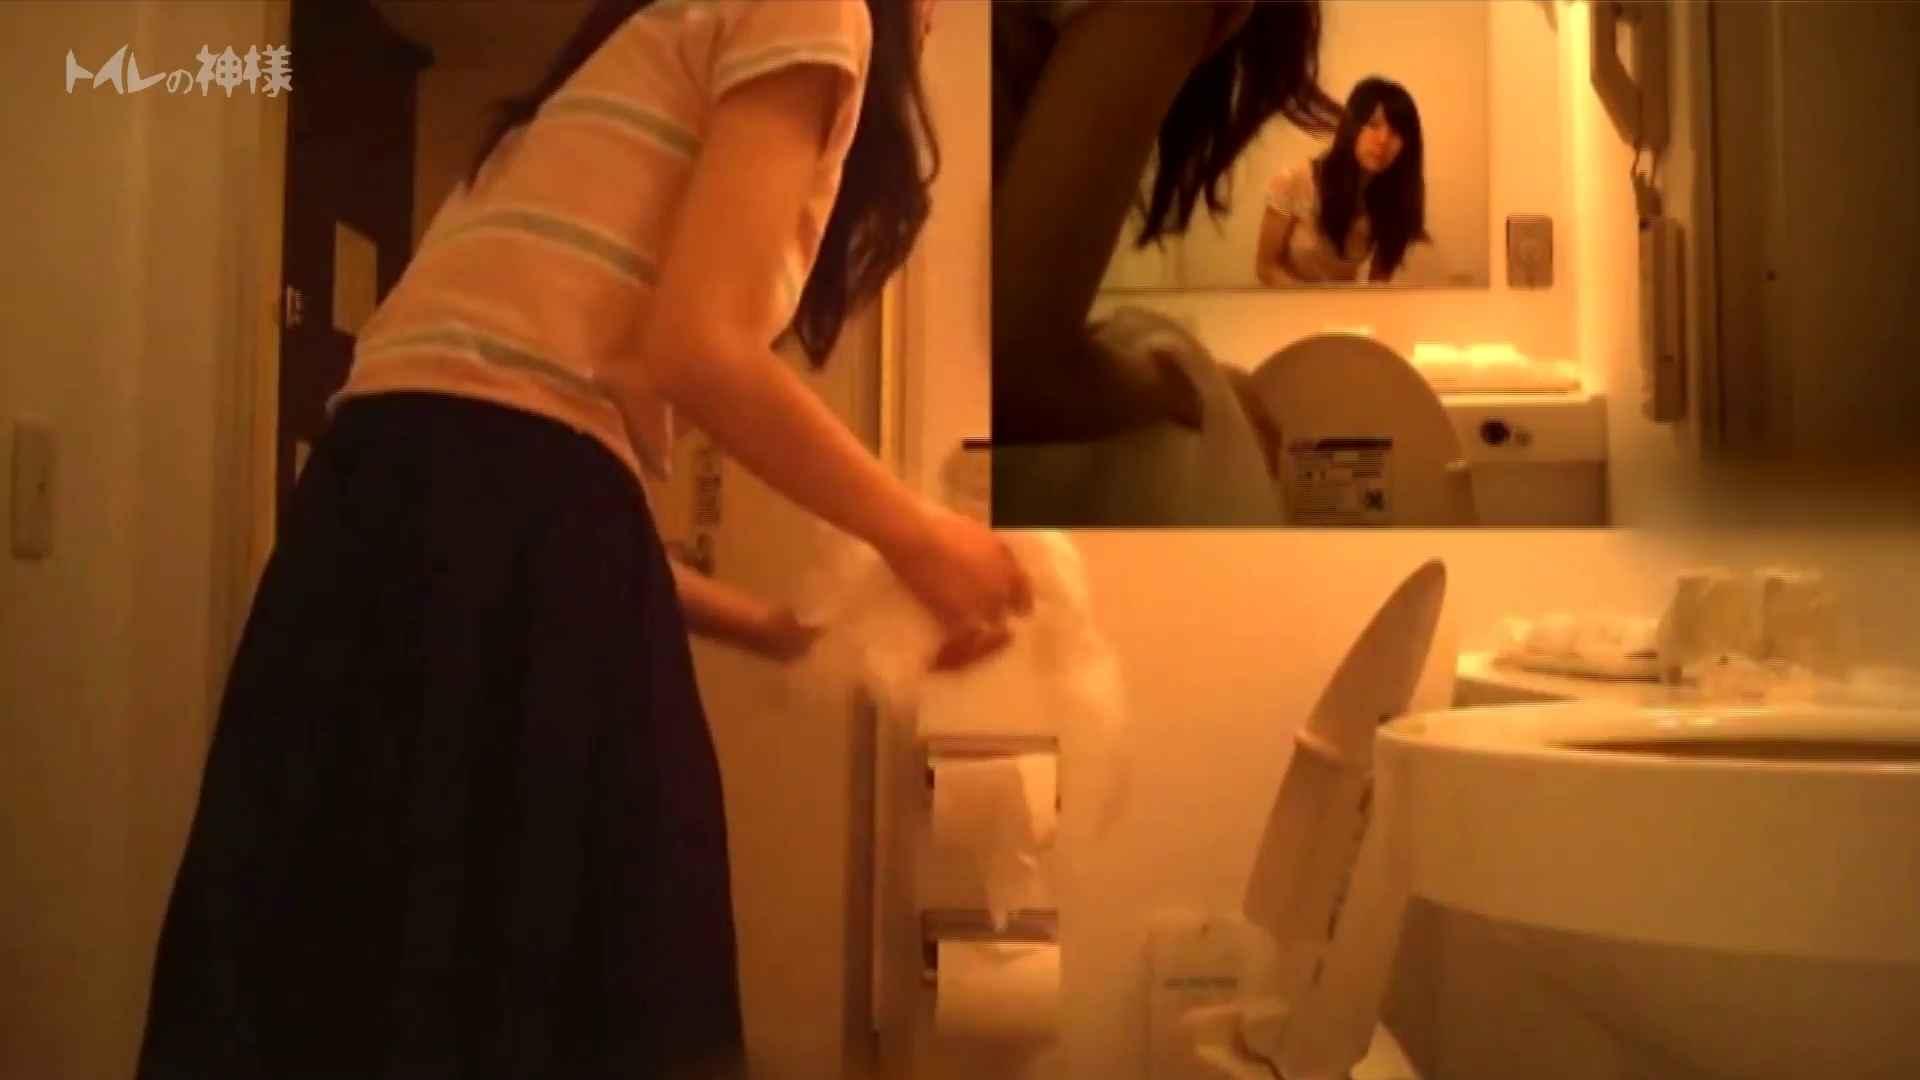 Vol.04 女子大生のトイレ恥態 トイレ盗撮 | 丸見え  92枚 37